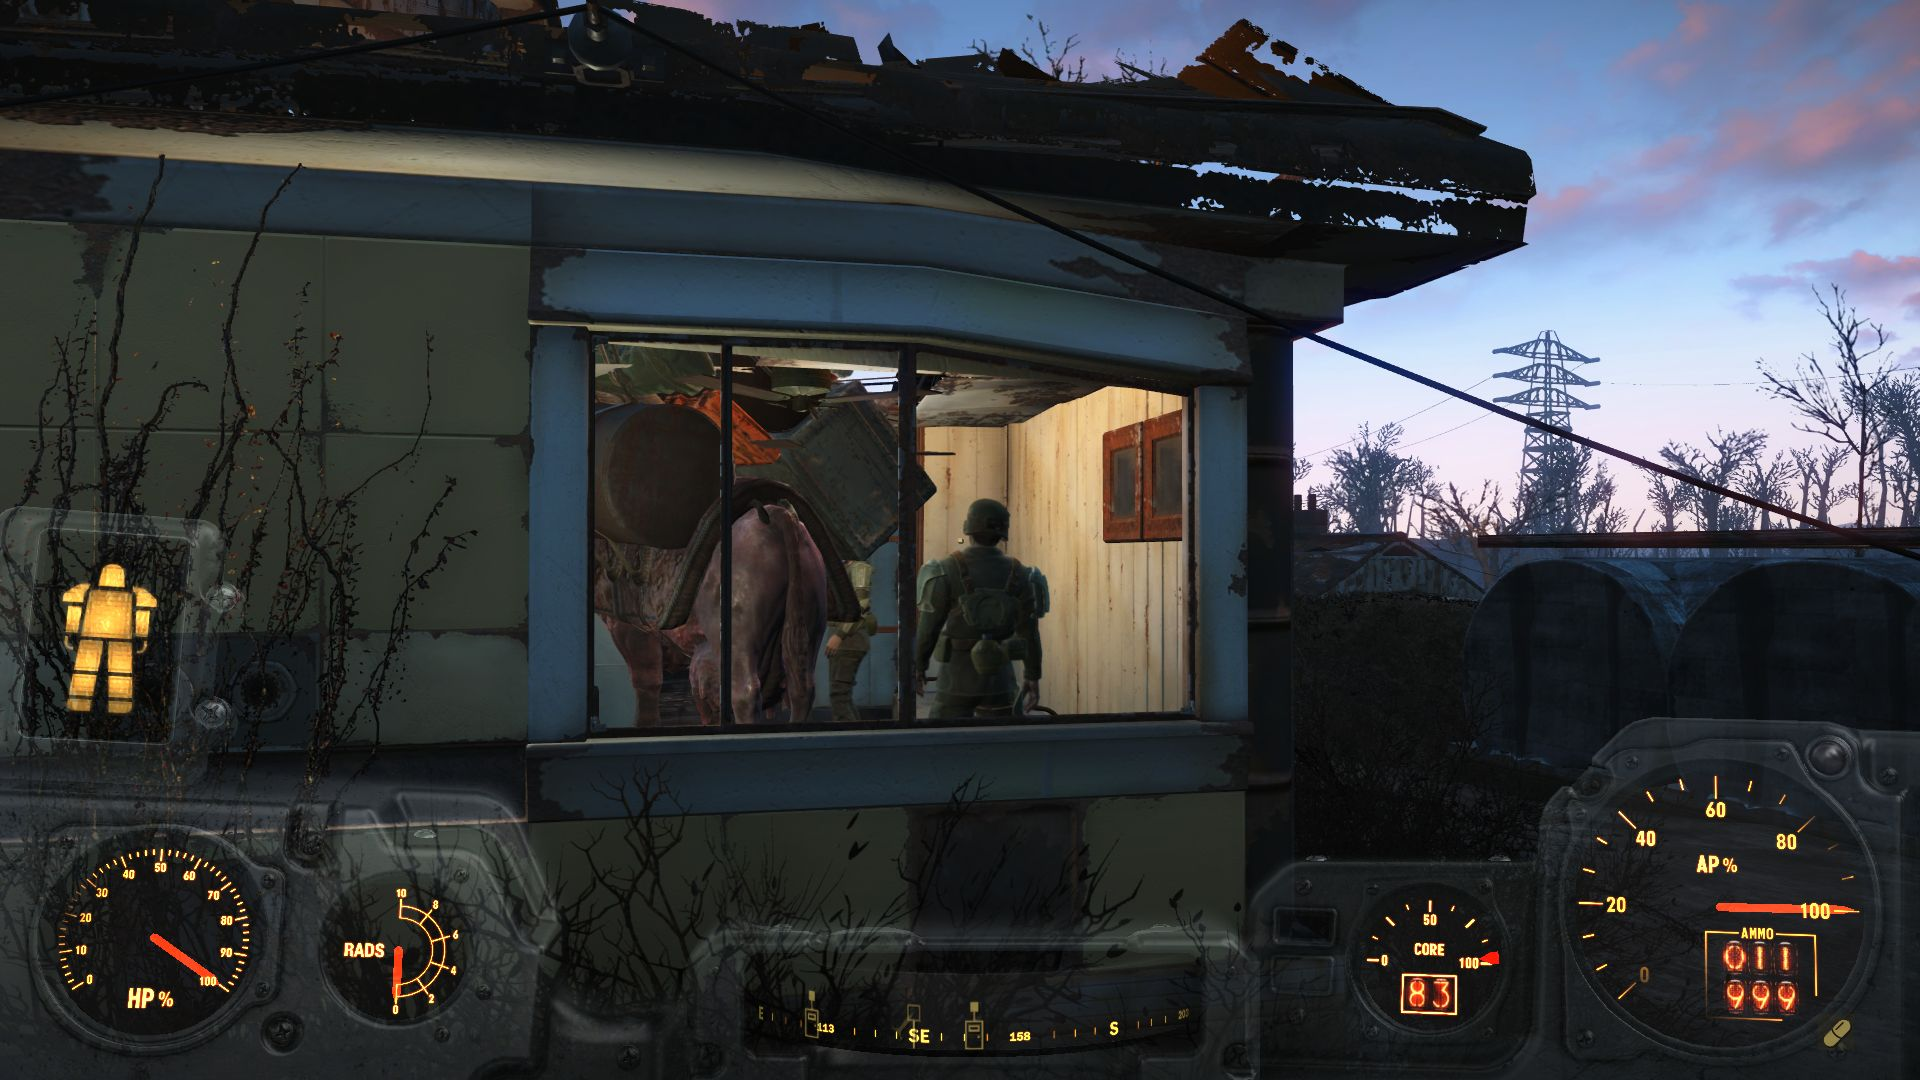 Дом - Fallout 4 баг, брамин, поселение, поселенцы, Сенкчуари